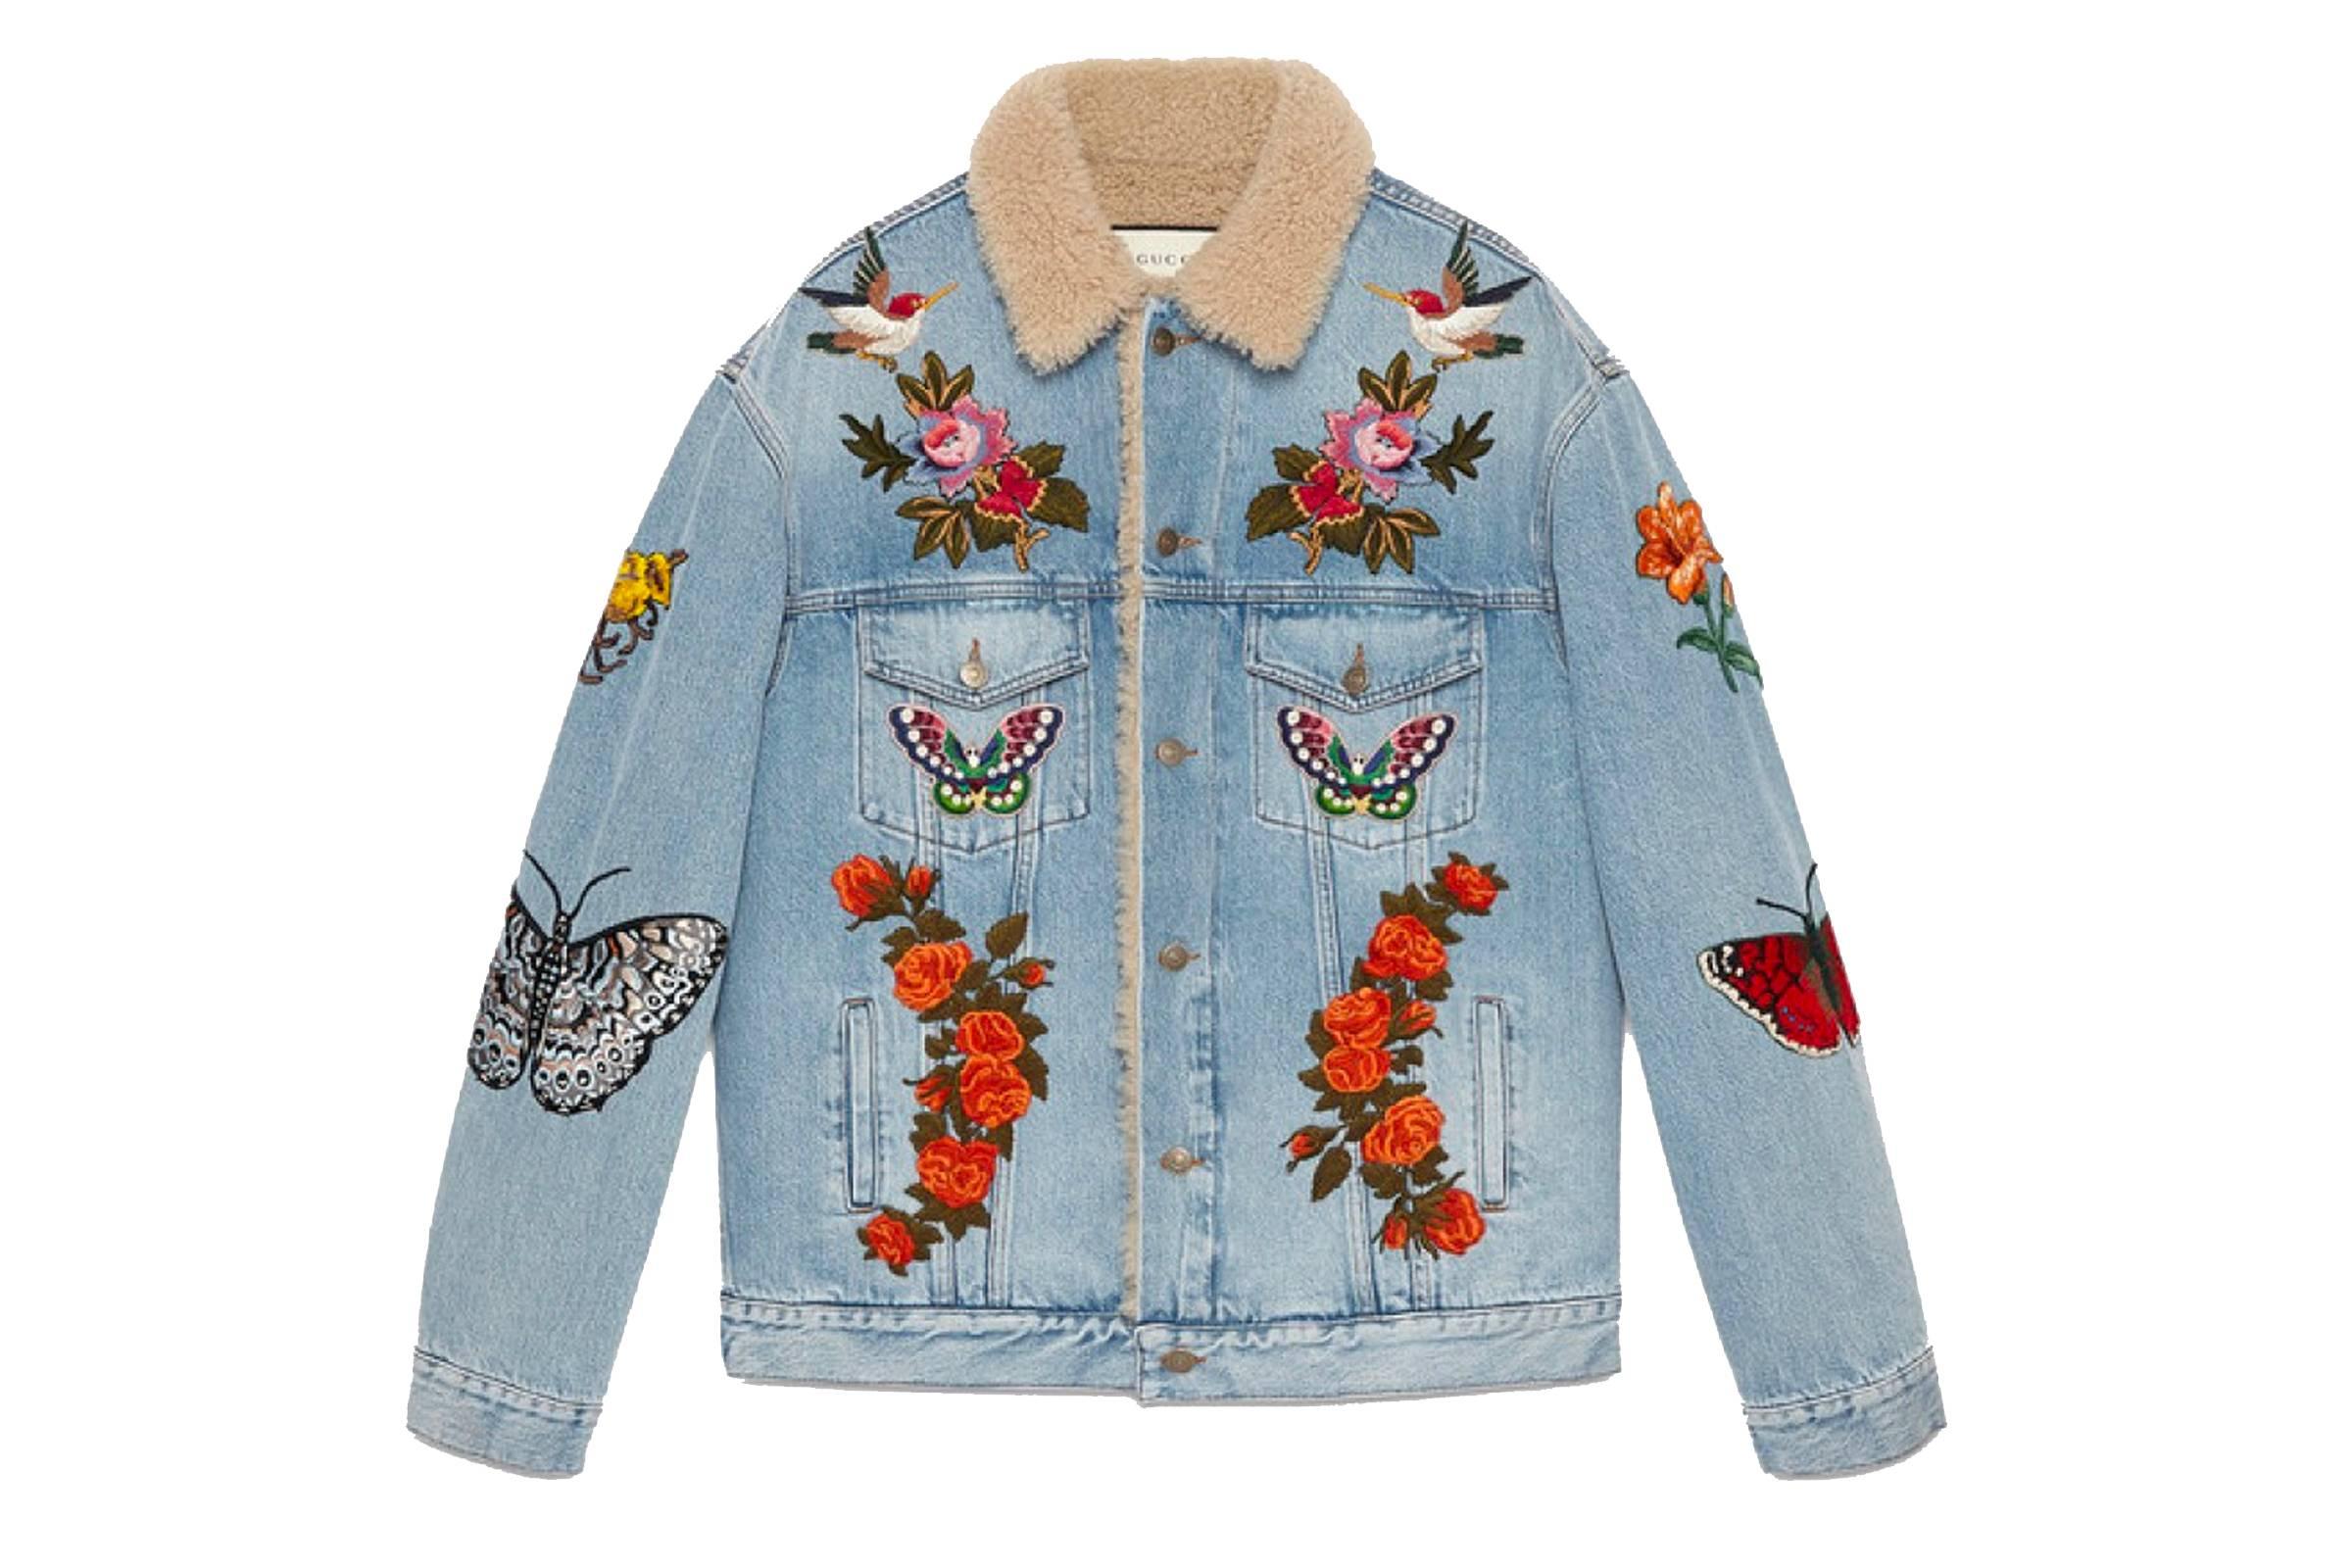 Denim Jackets, M-65s and Chore Coats